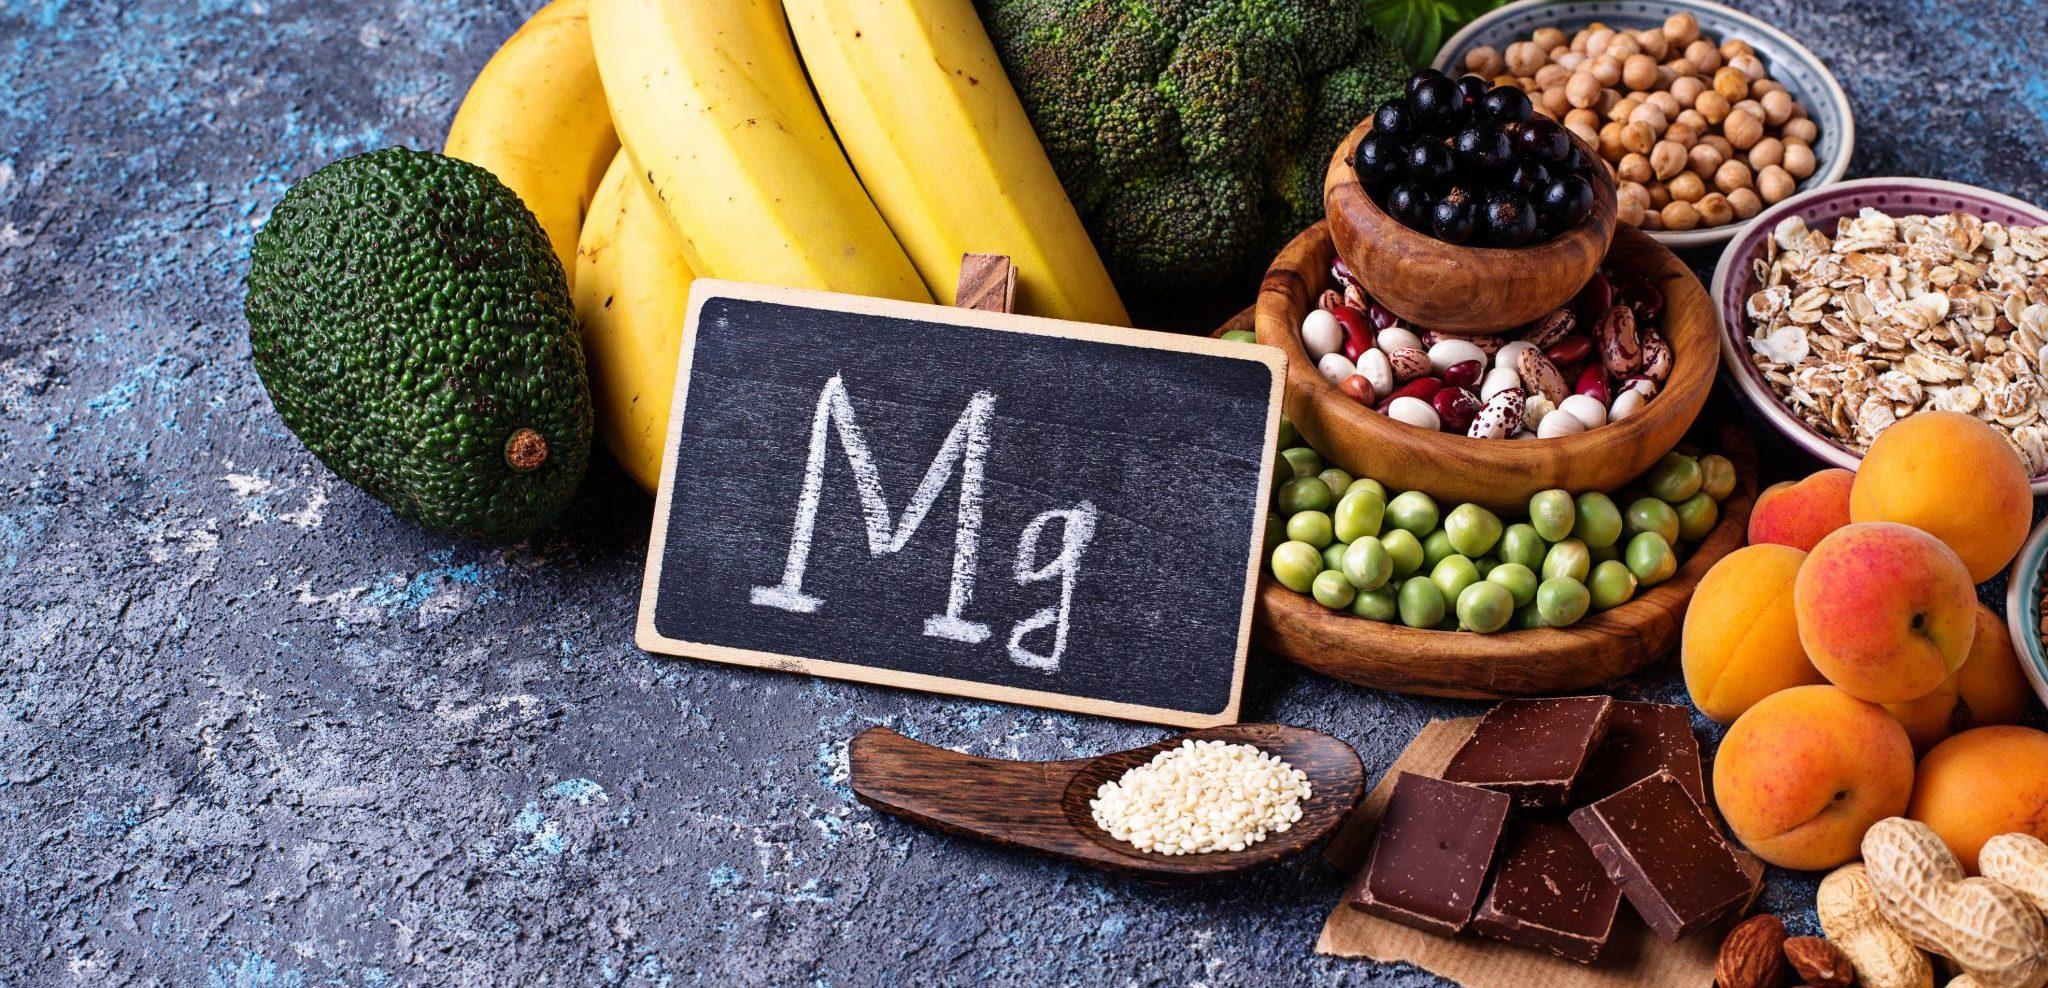 Does Magnesium Help Lower Blood Pressure?